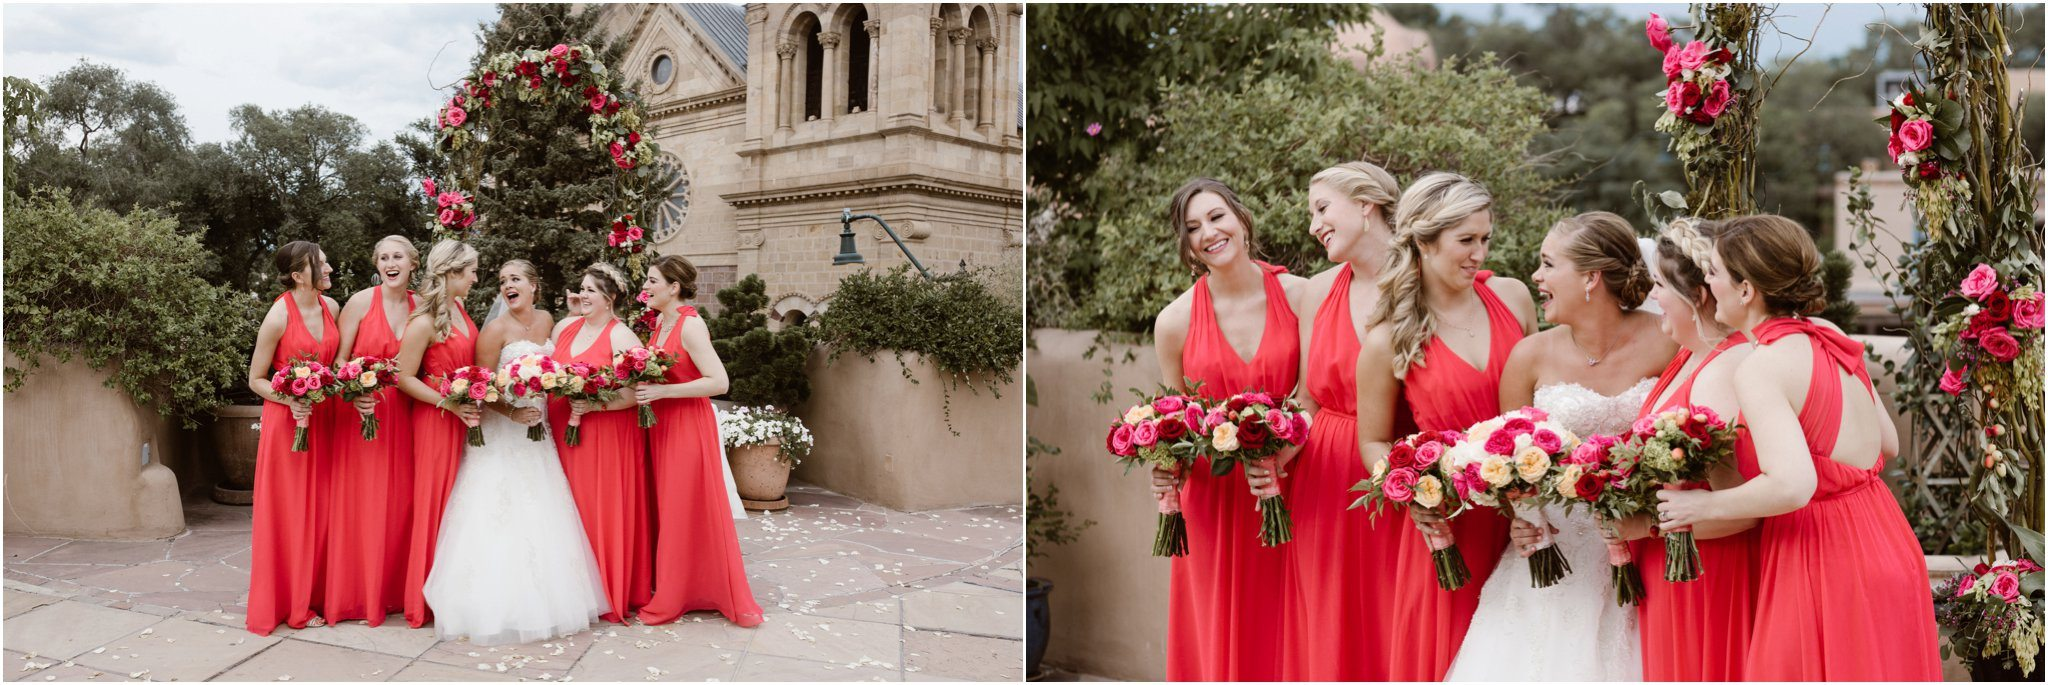 0052albuquerque-wedding-photographer_-santa-fe-wedding-photographer_-southwest-wedding-photography_-blue-rose-studio